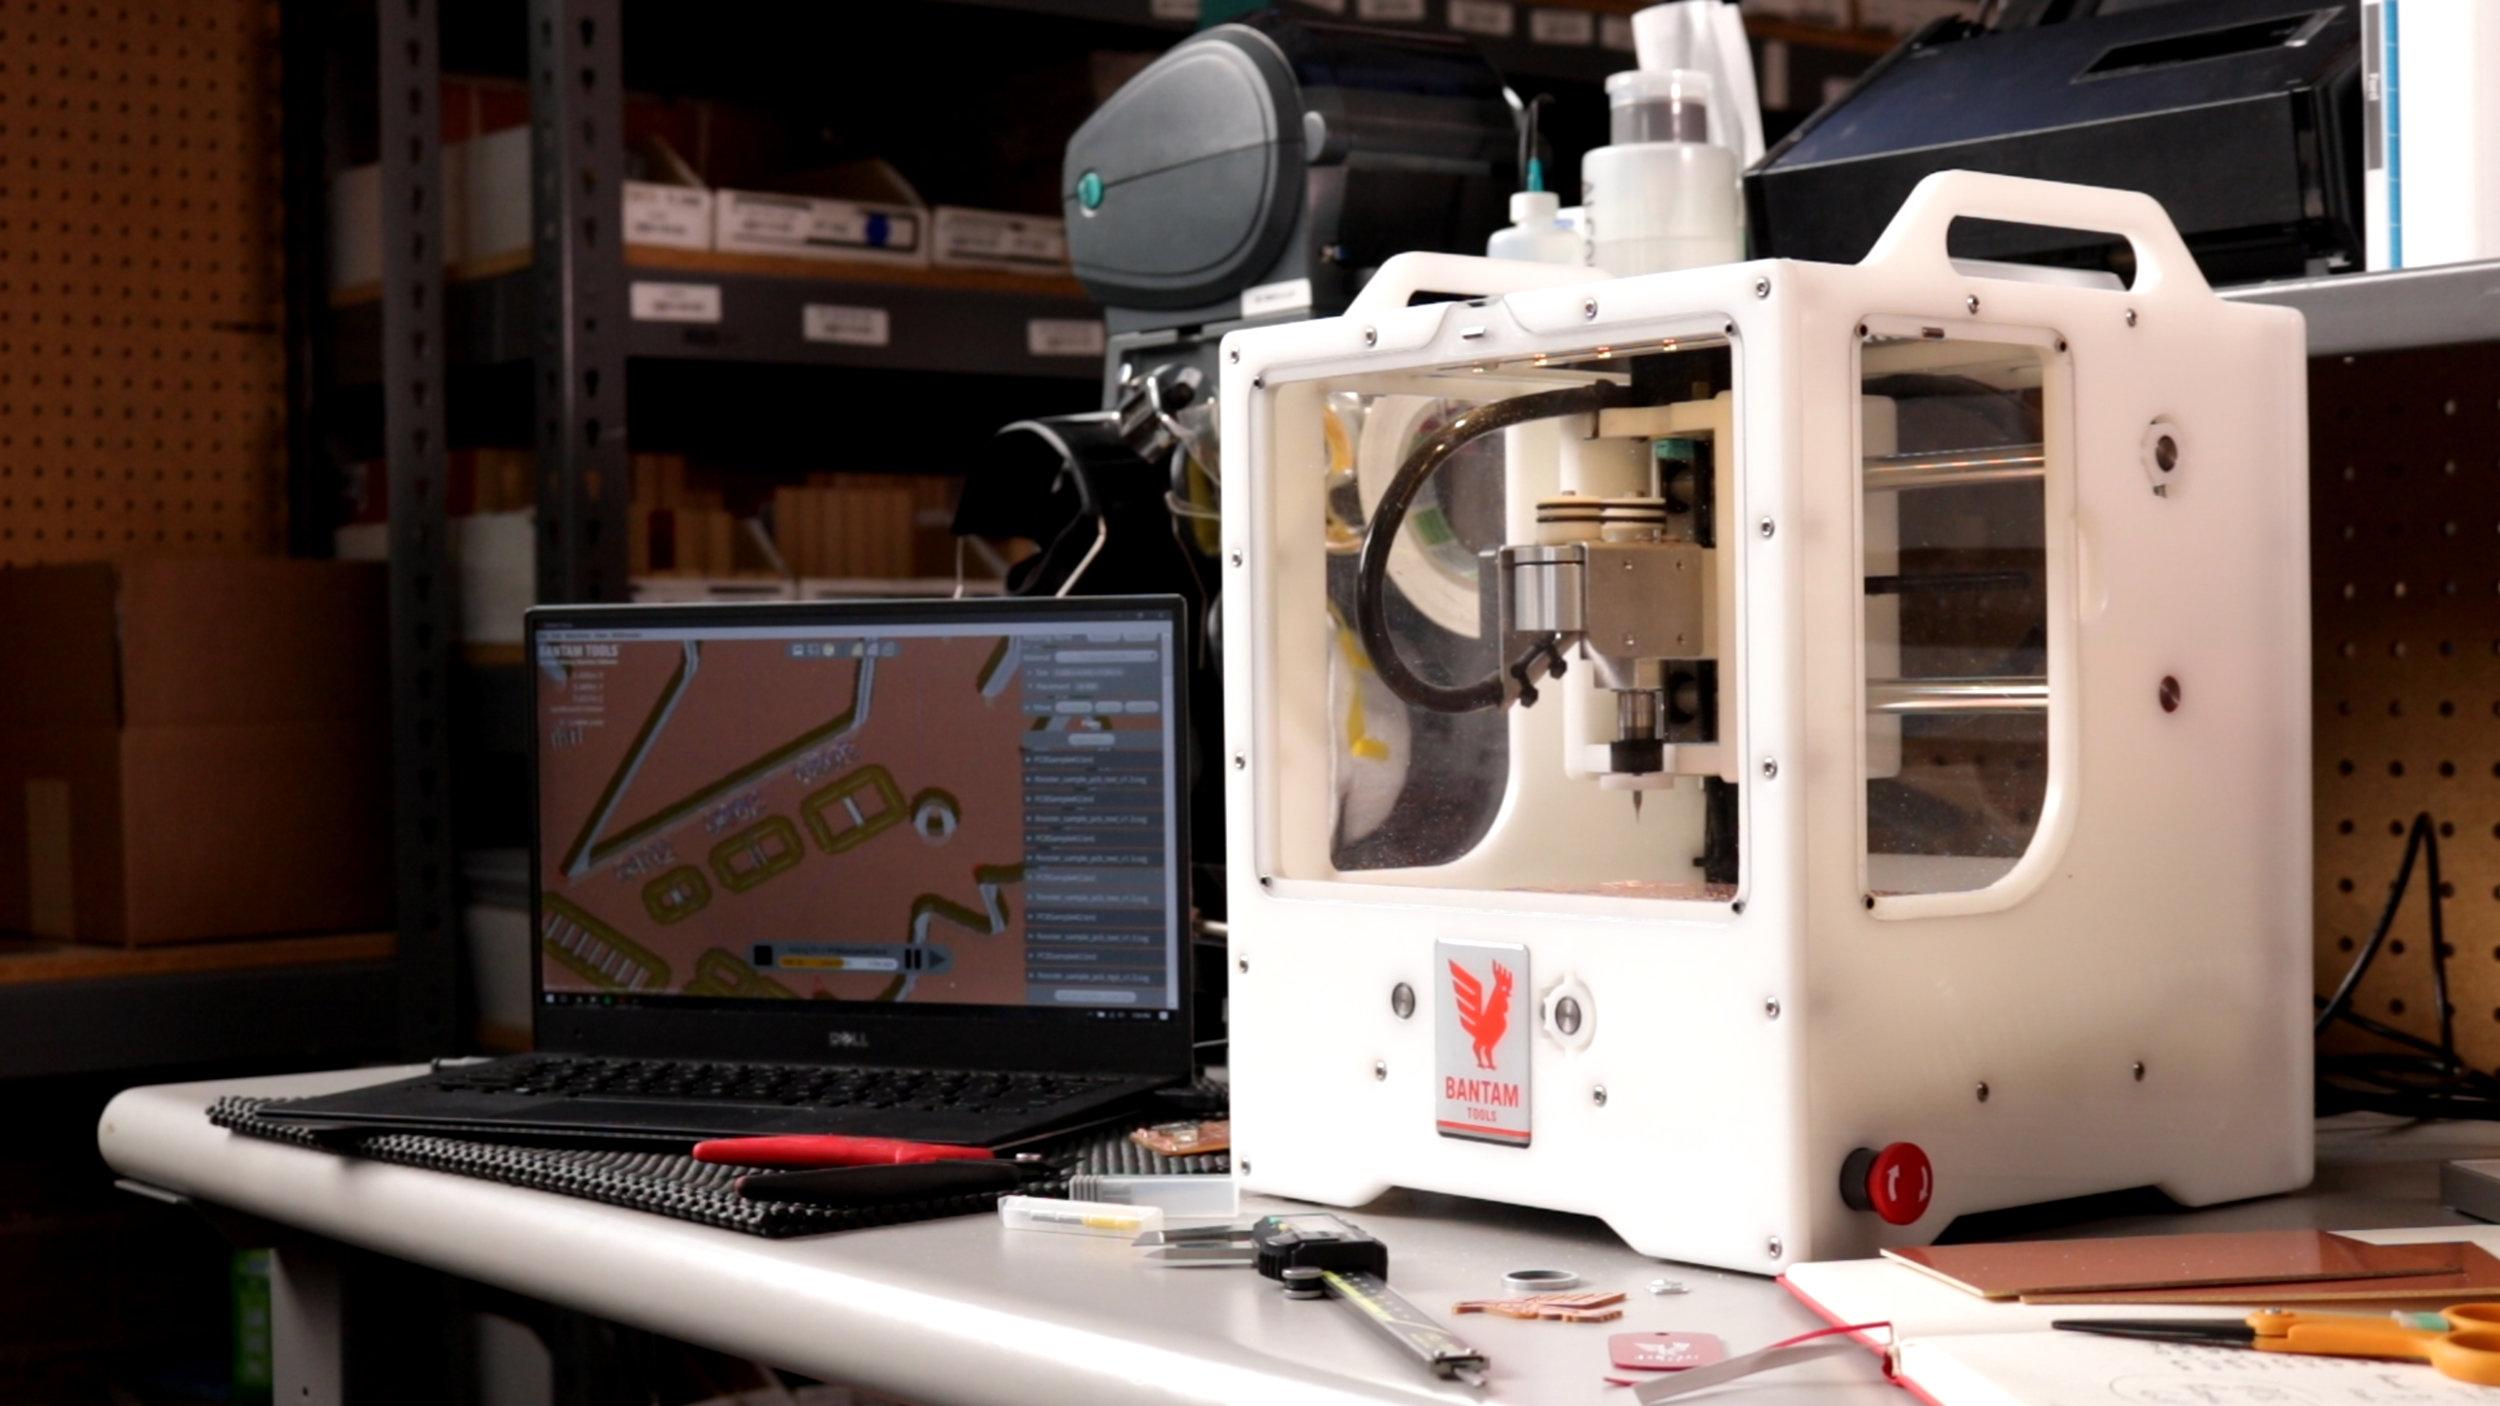 - Desktop PCB Milling Machine